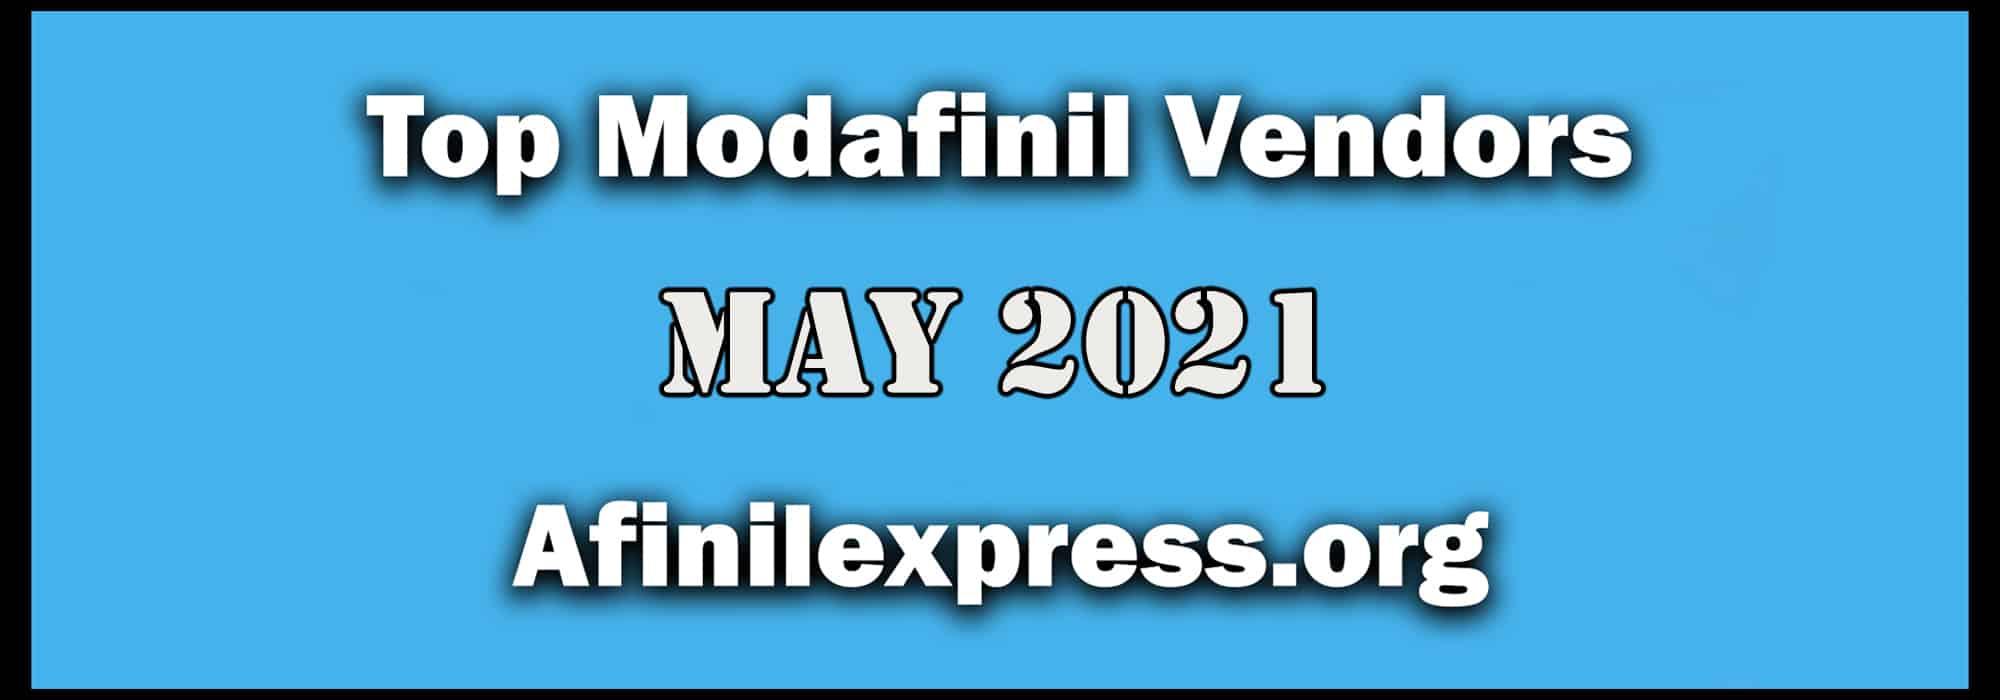 Top 3 Modafinil Vendors May 2021